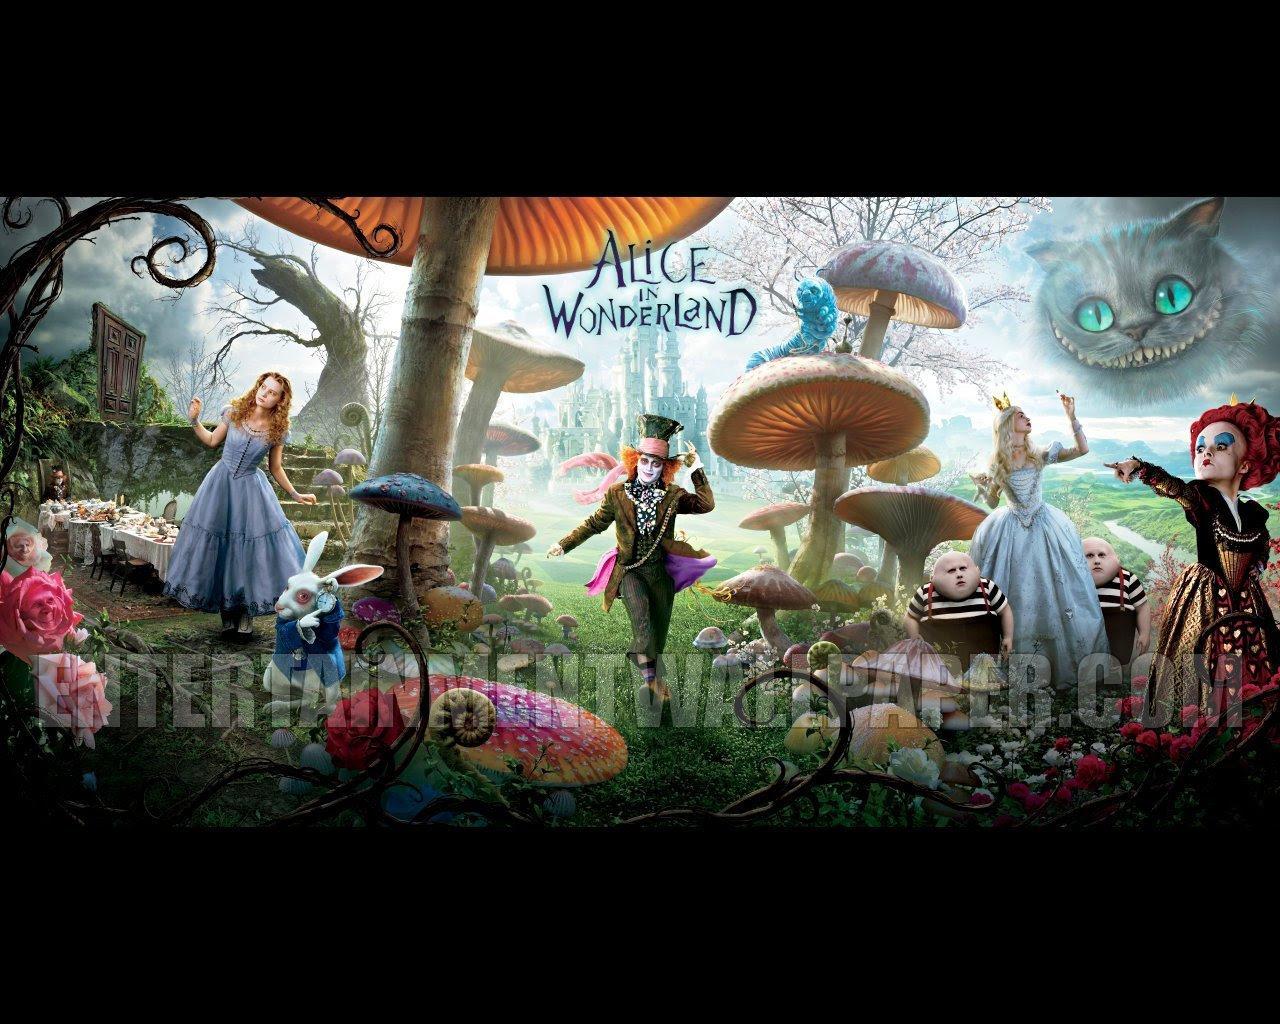 alice in wonderland ;)